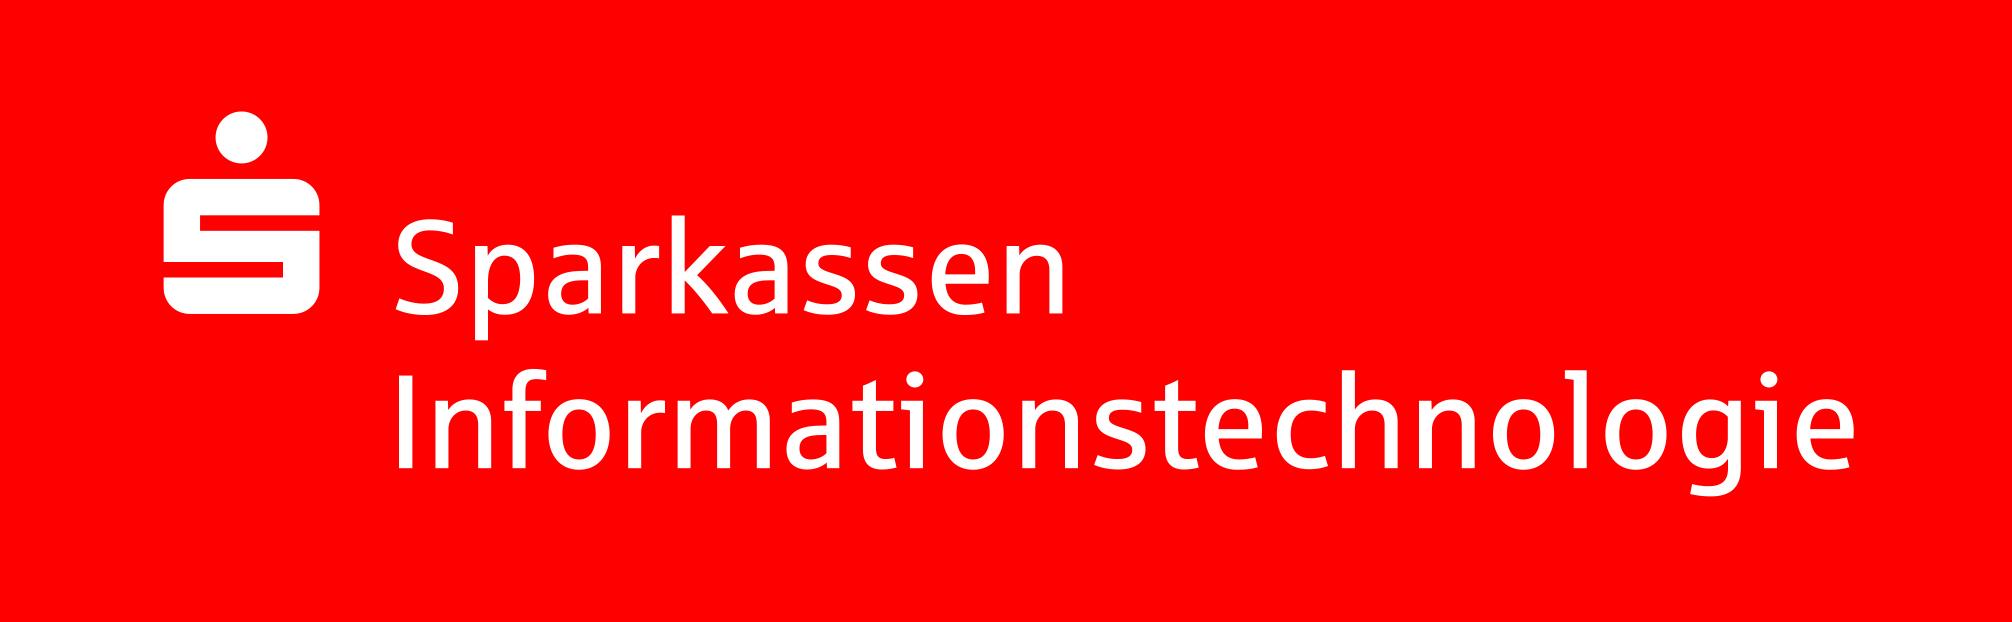 S-IT Informationstechnologie GmbH & co. KG